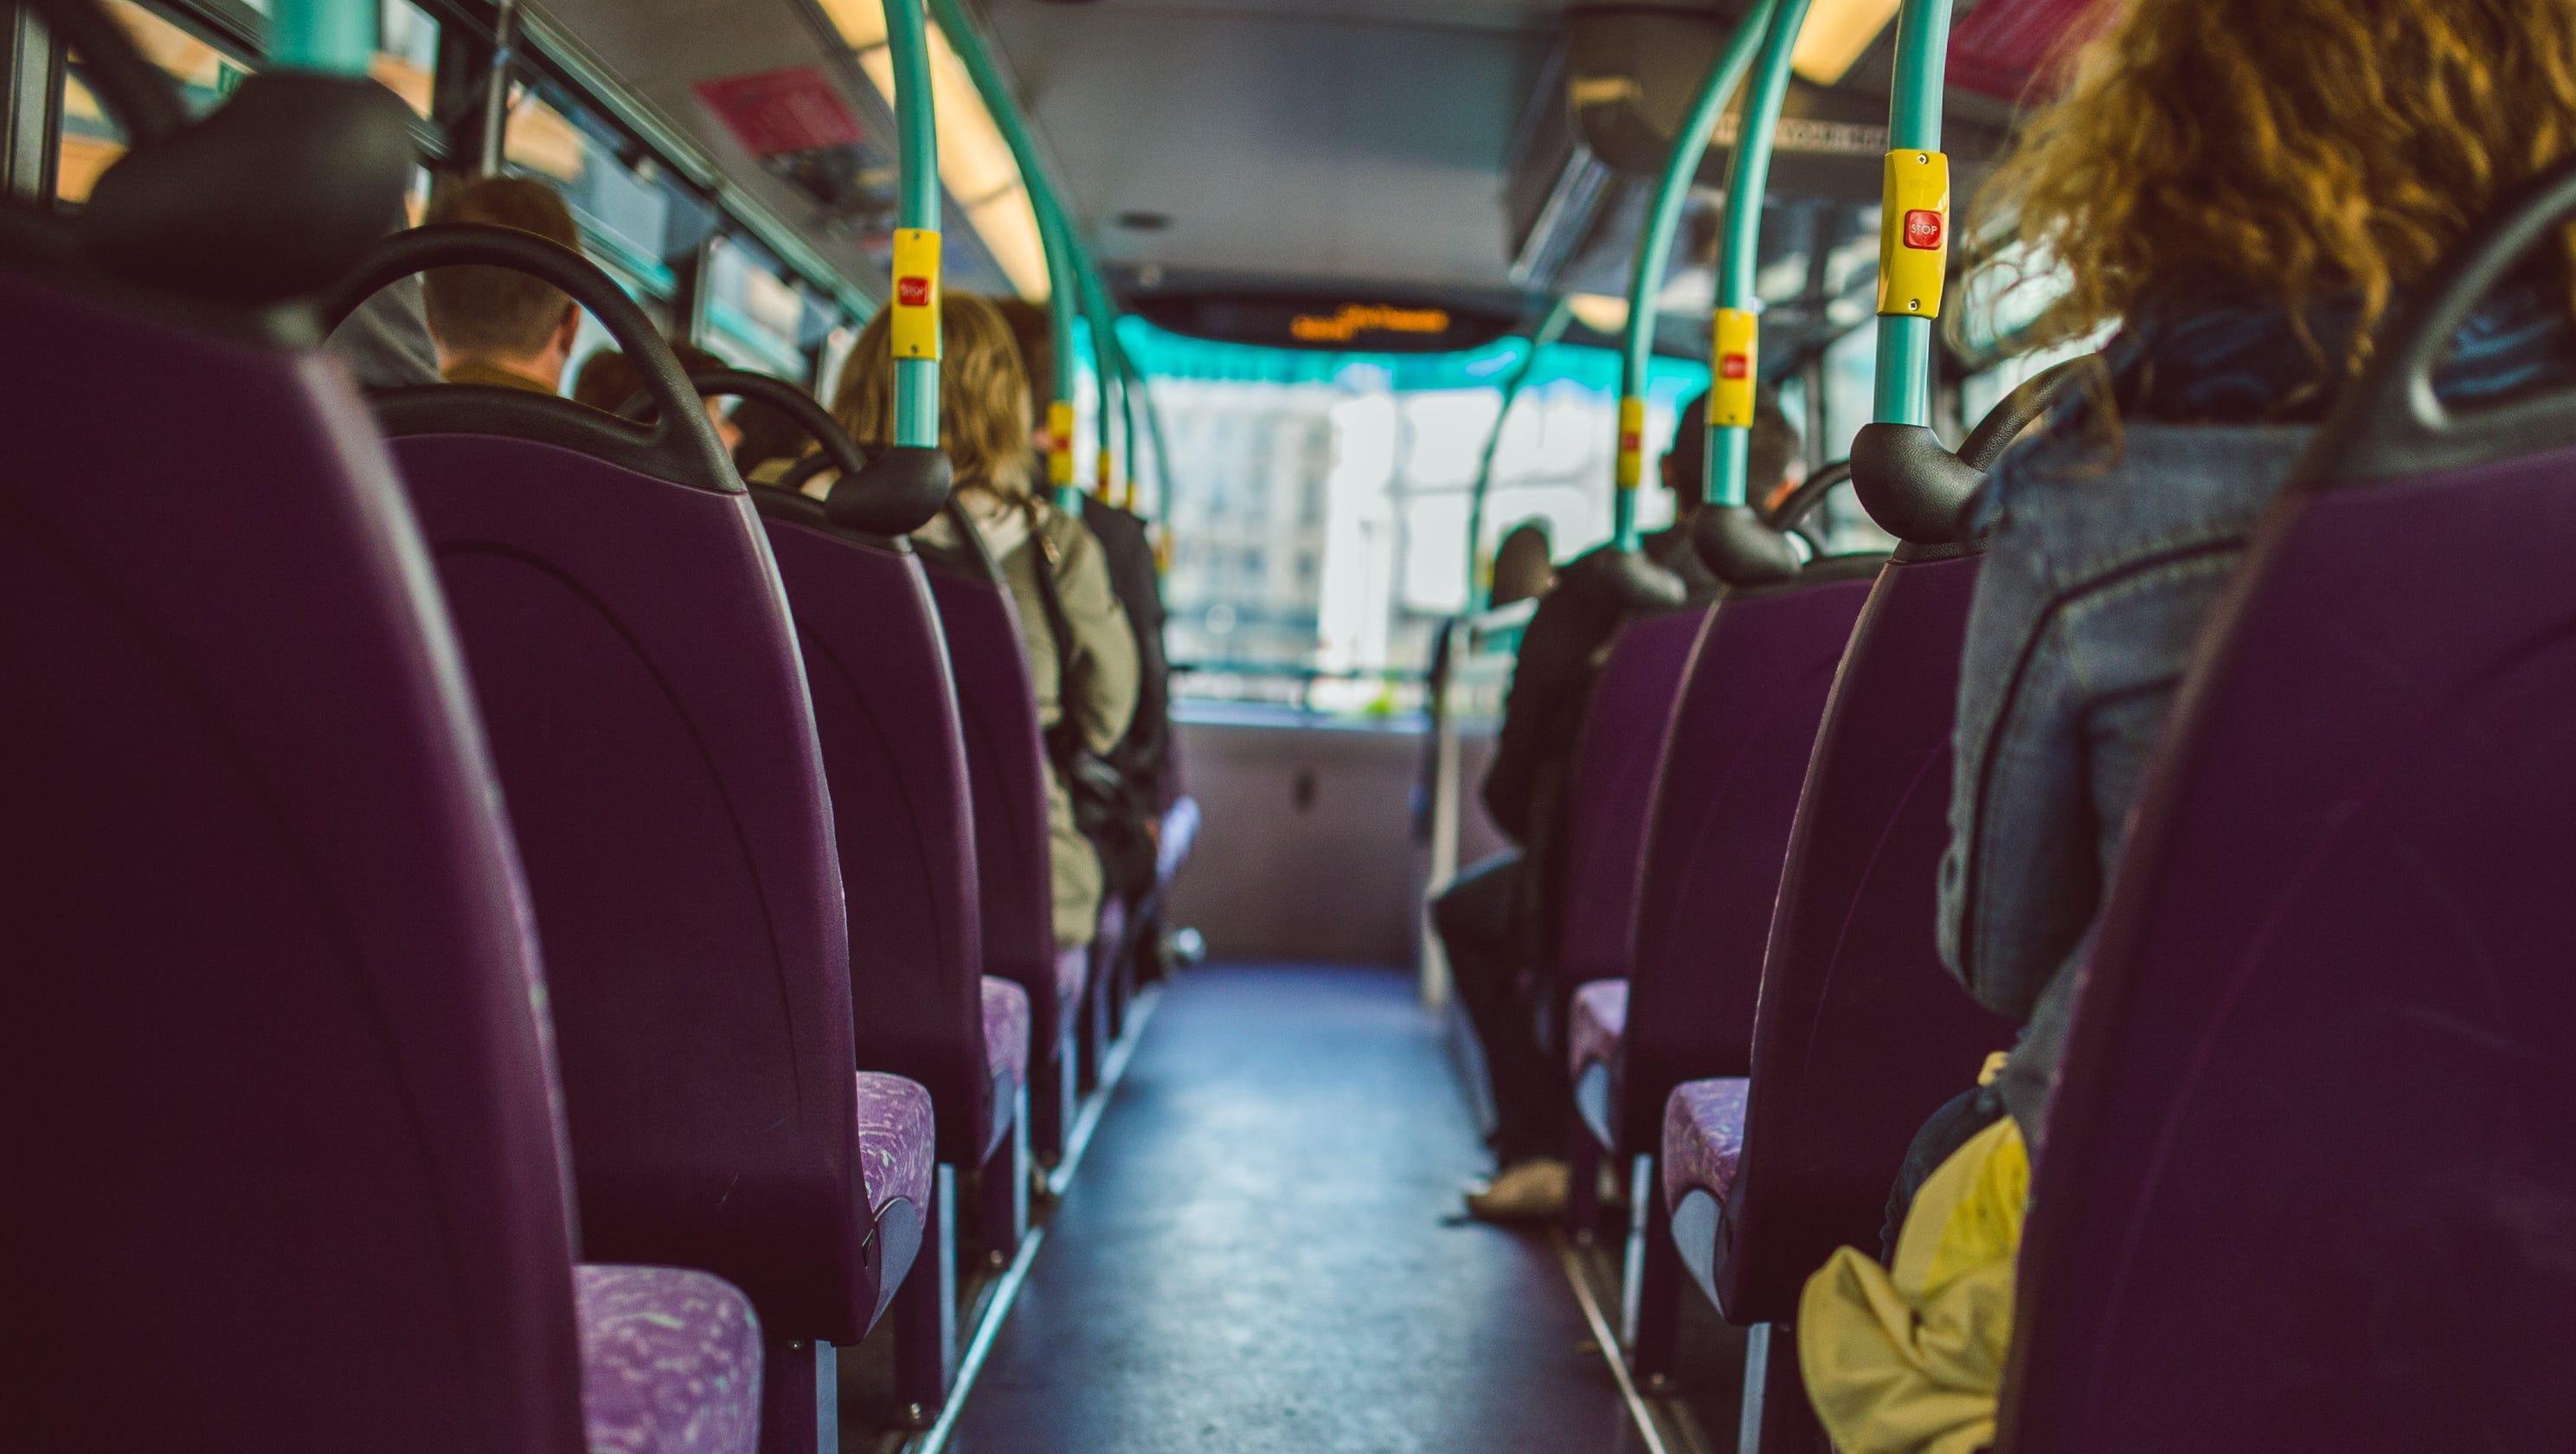 Academy Bus service between Sayreville, 2 New York City